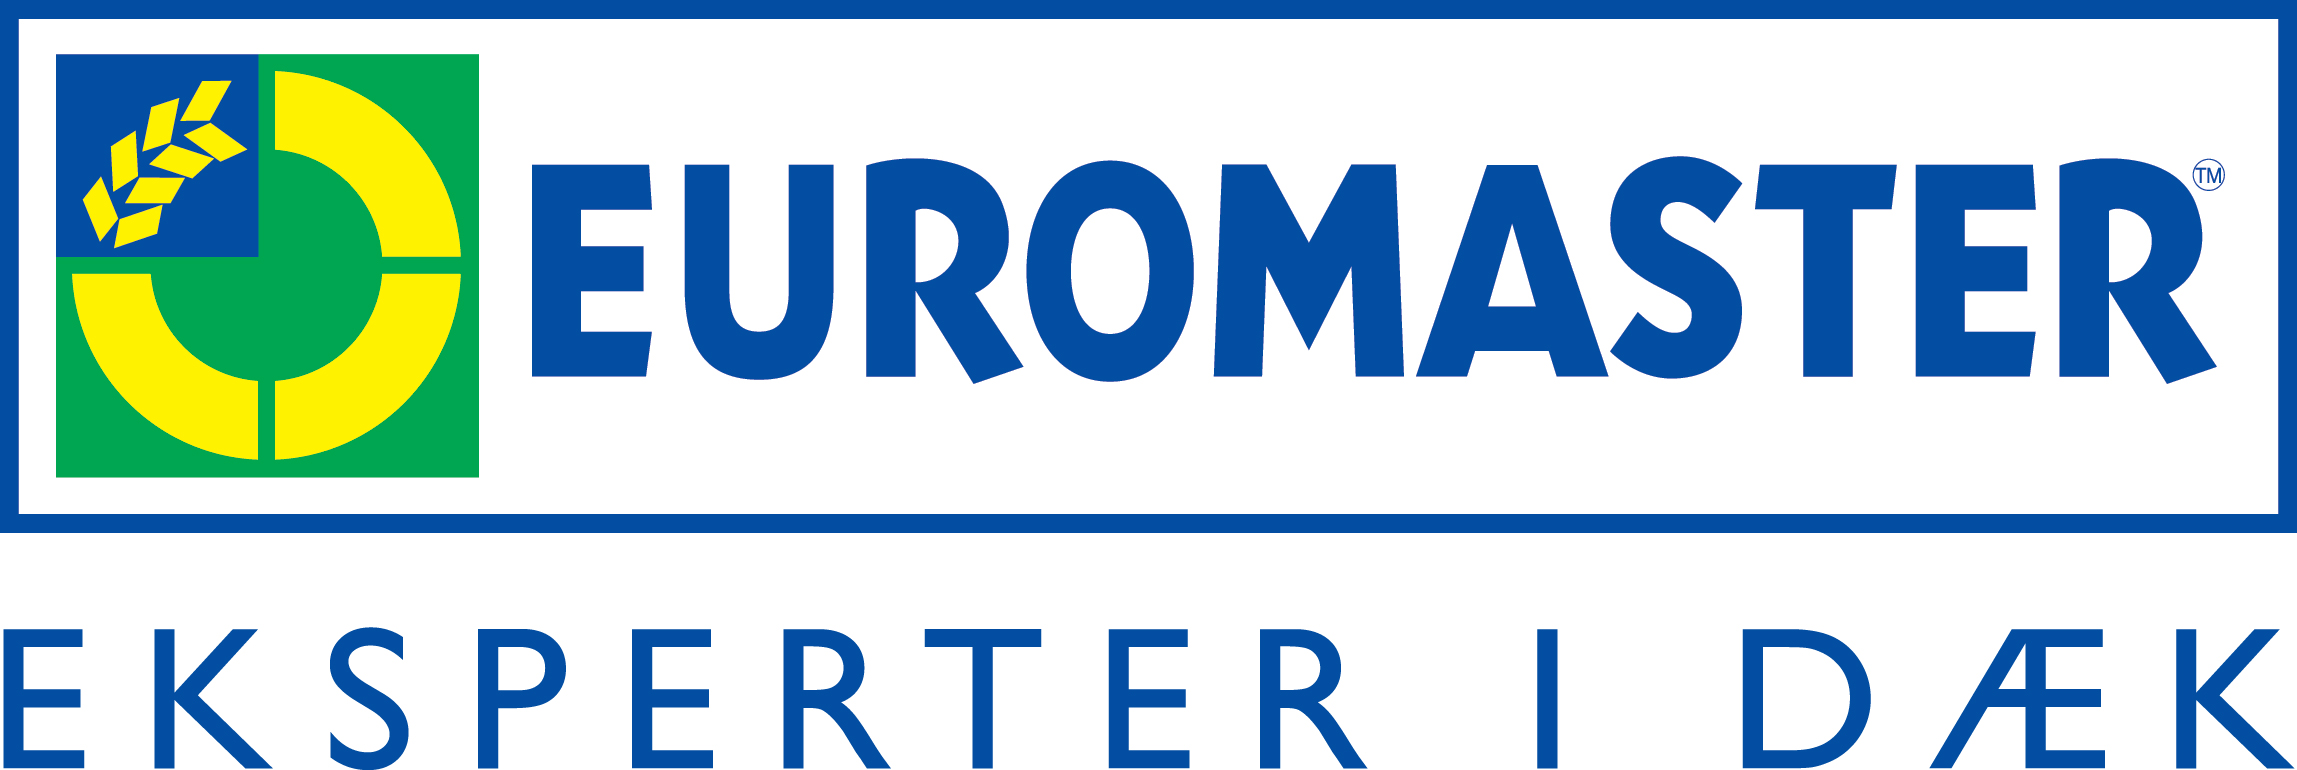 Euromaster Skejby logo